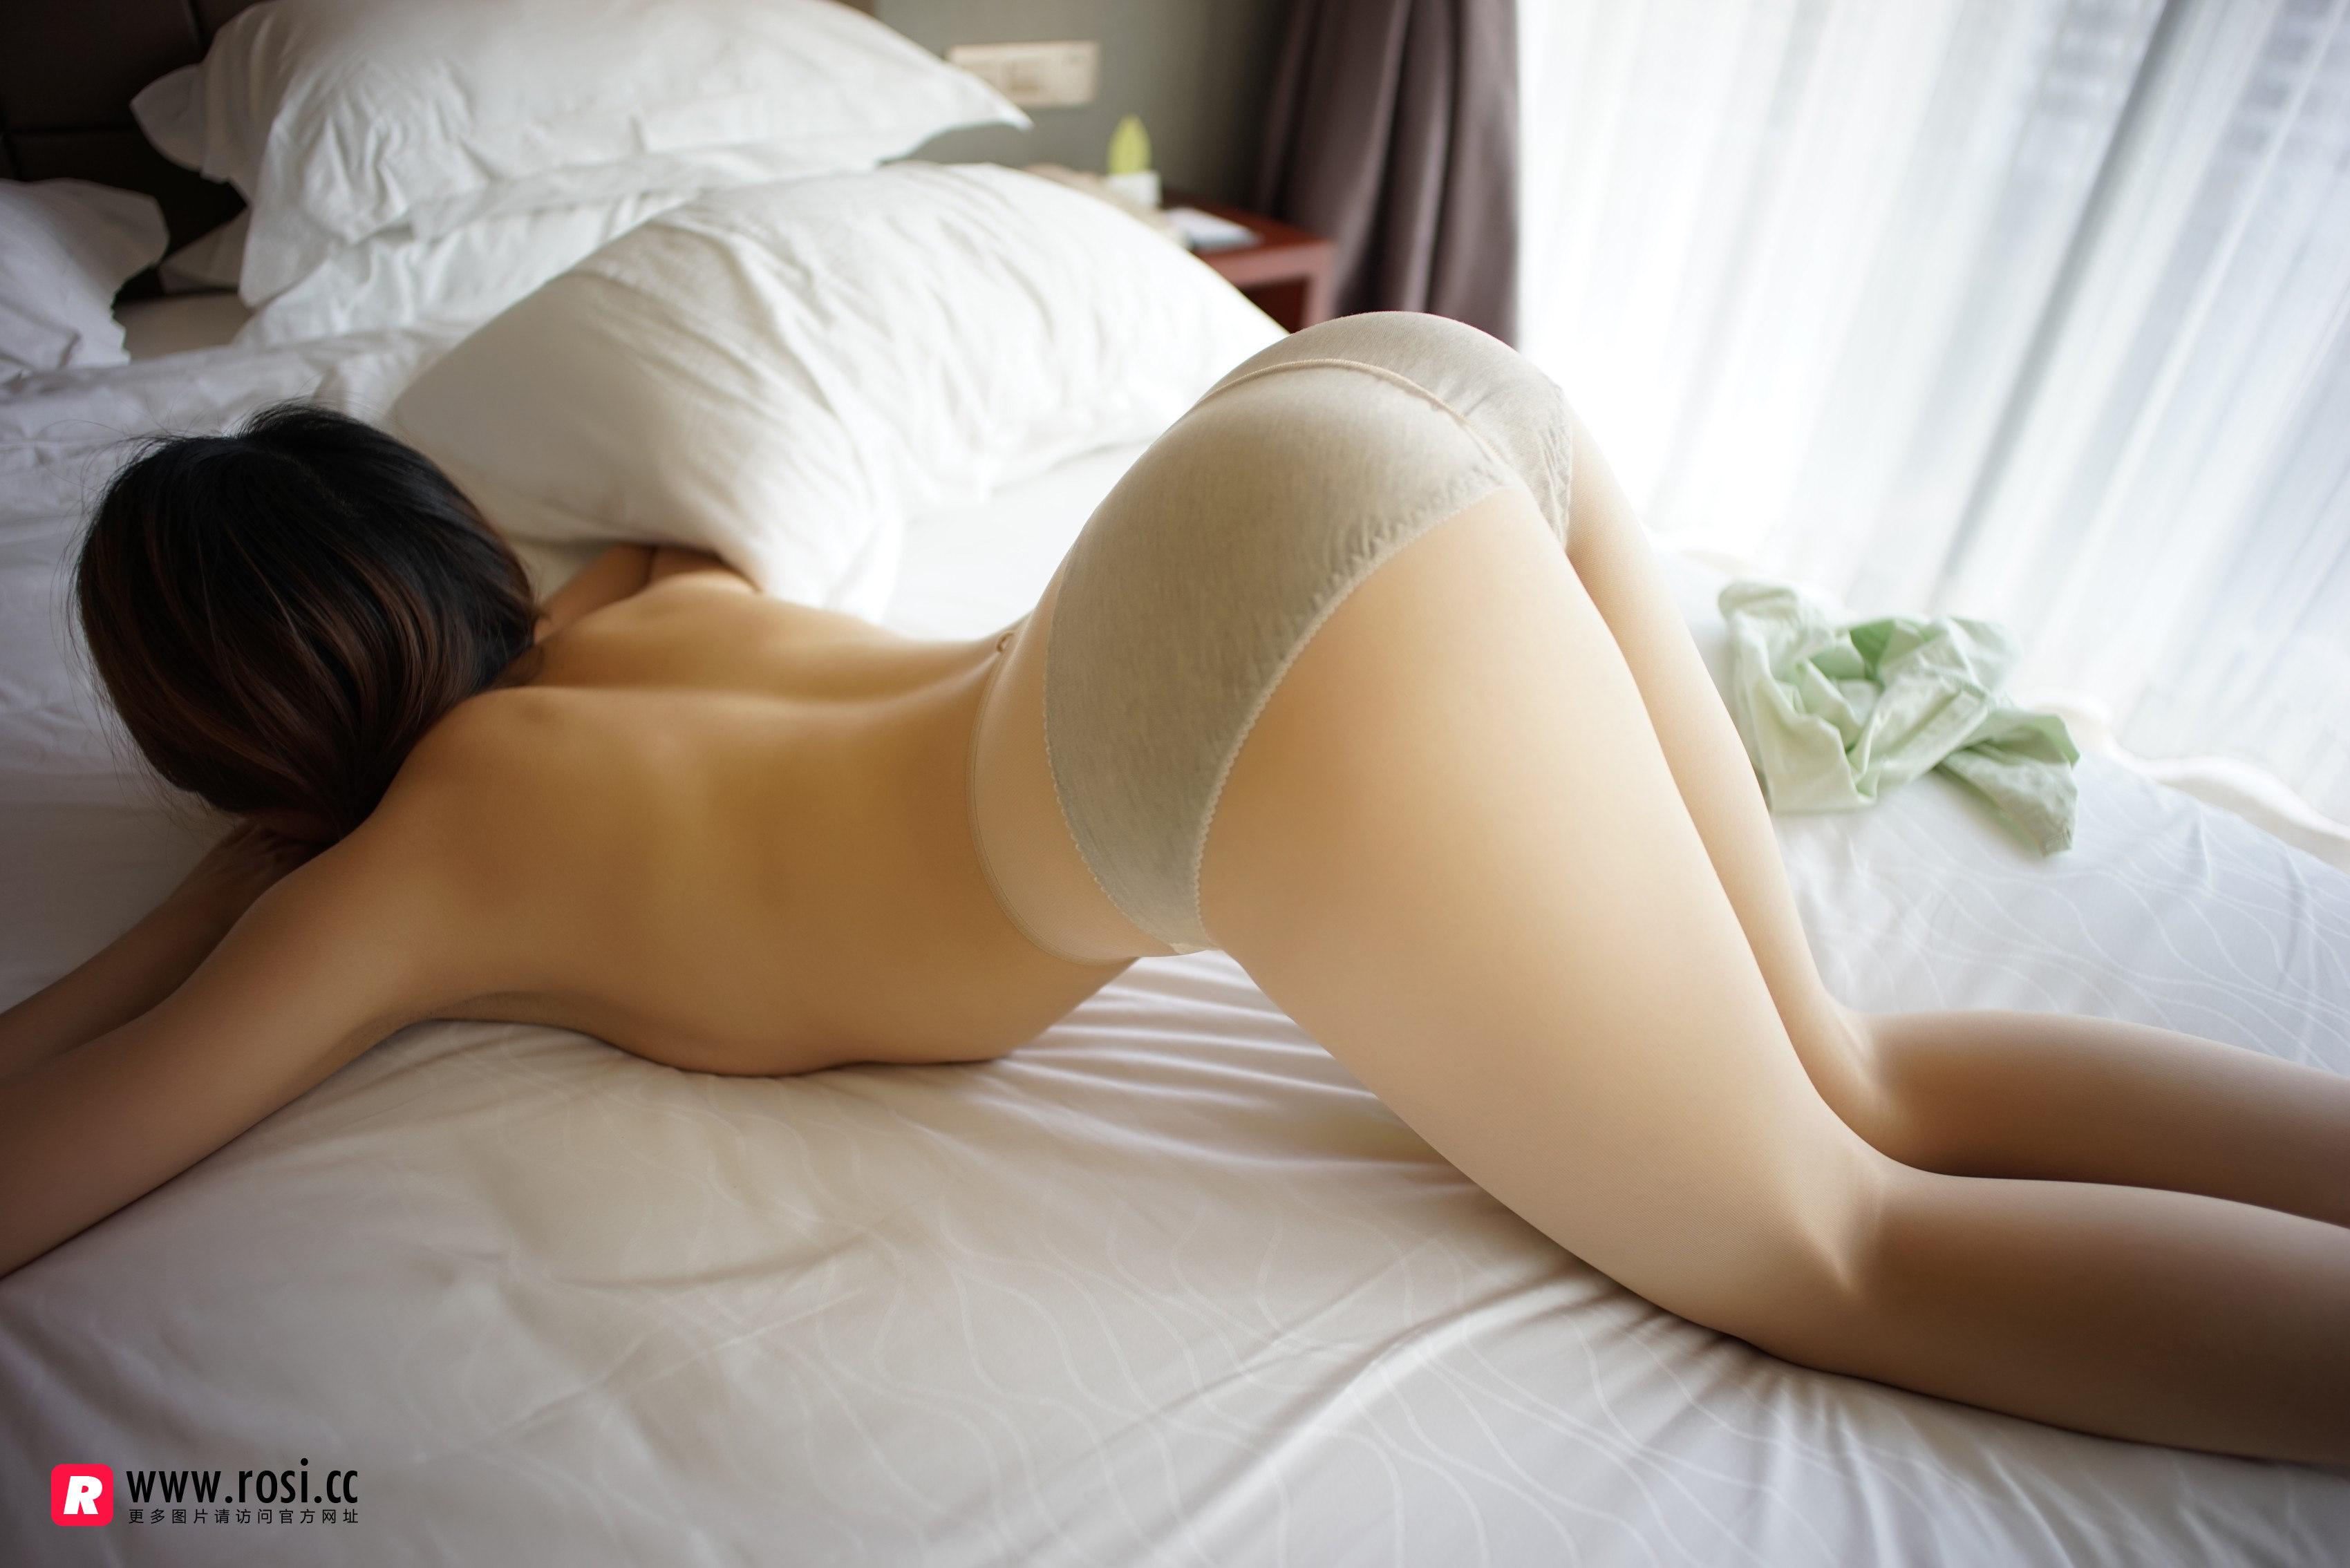 PRED-260波多野结衣(はたの ゆい)姐妹诊所~欢迎来治疗!!-来了社长